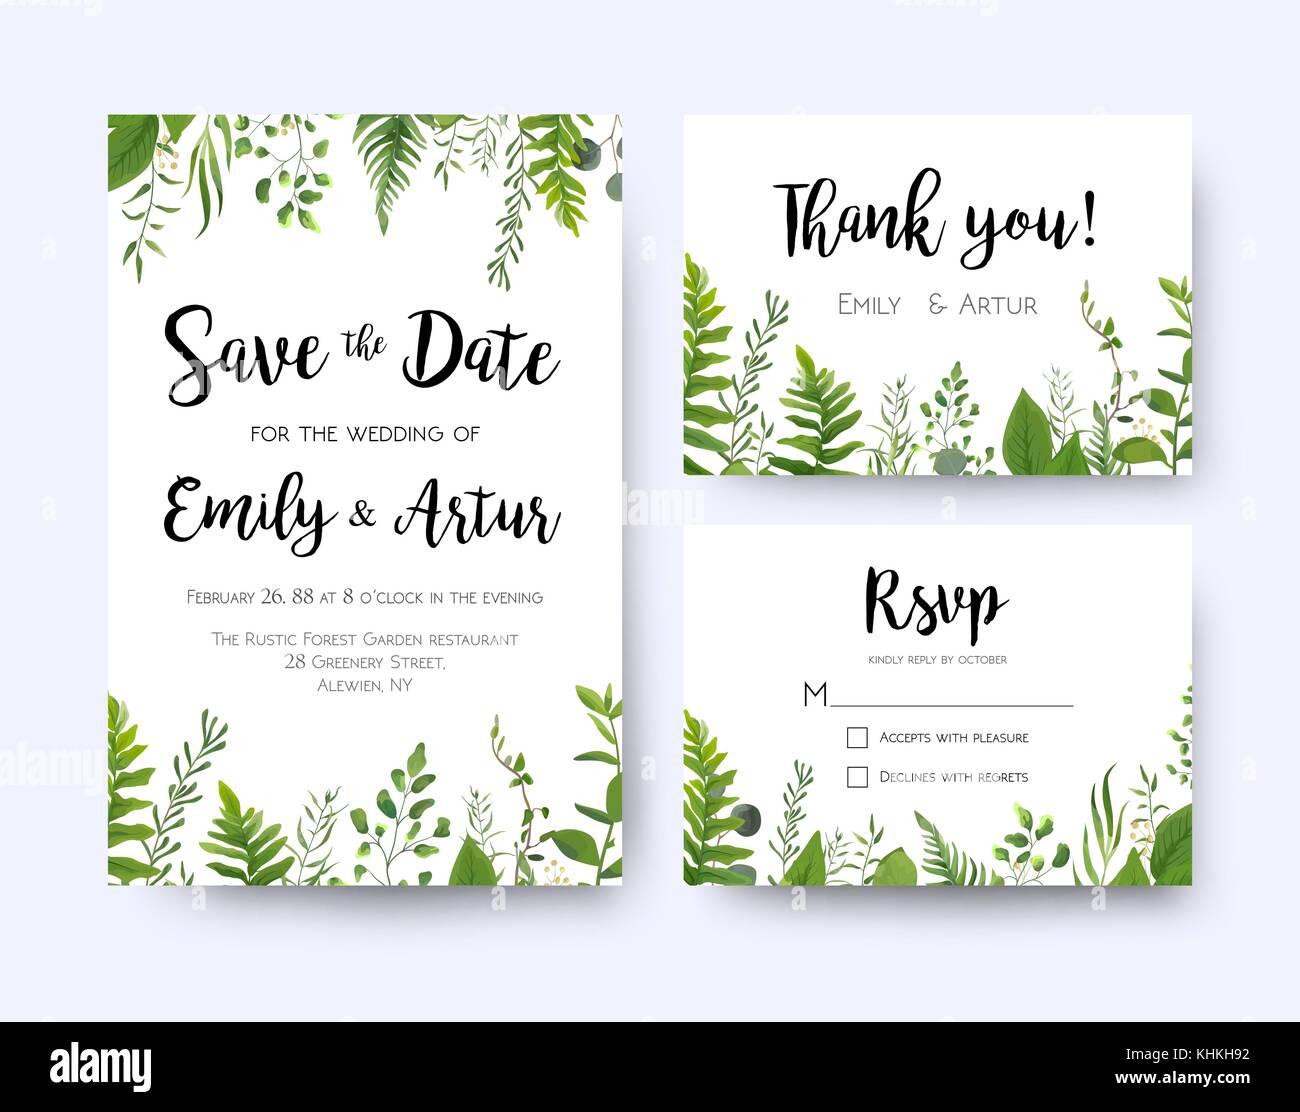 Invitation Mariage Invitation Carte De Remerciement Rsvp Menu